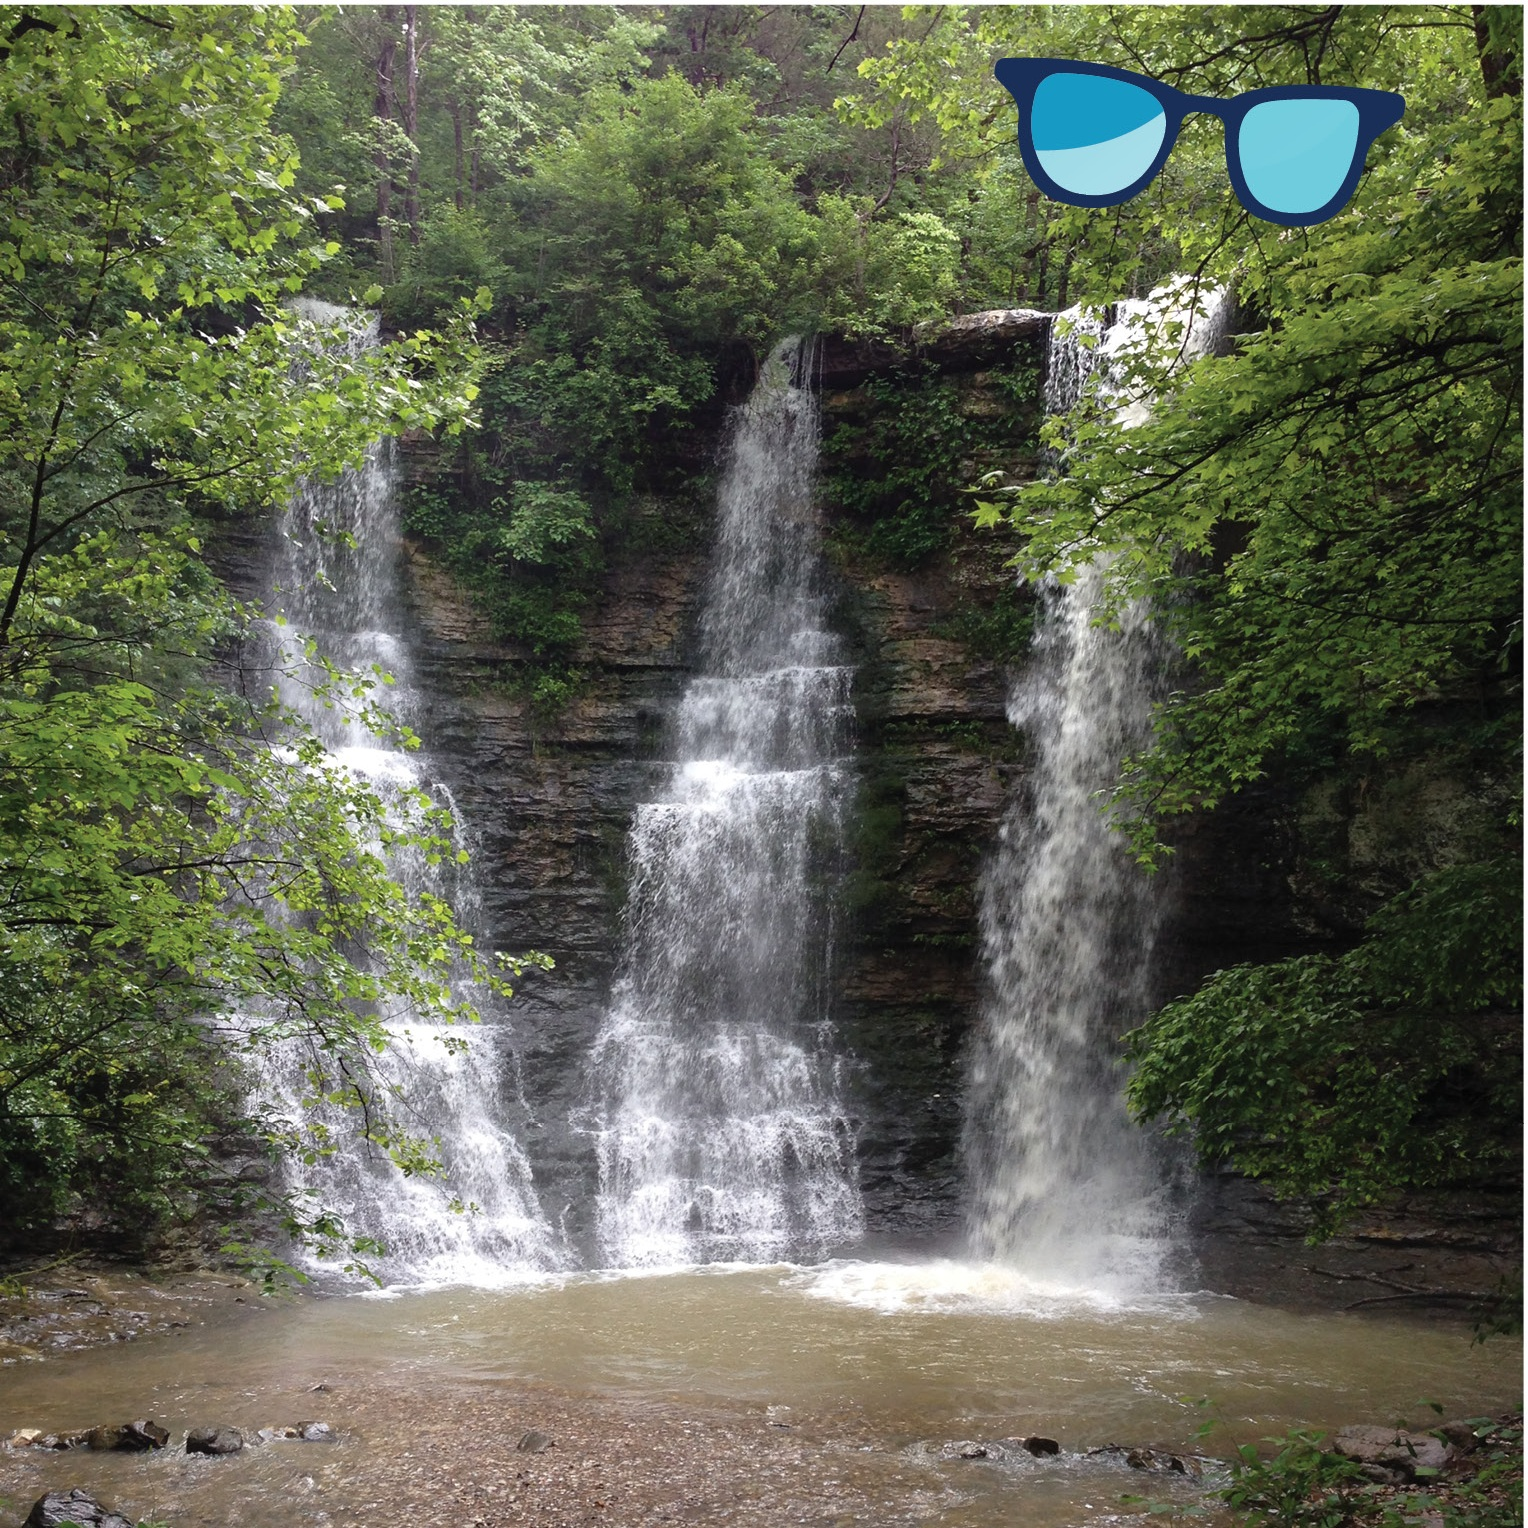 Photo Courtesy of: National Parks Service